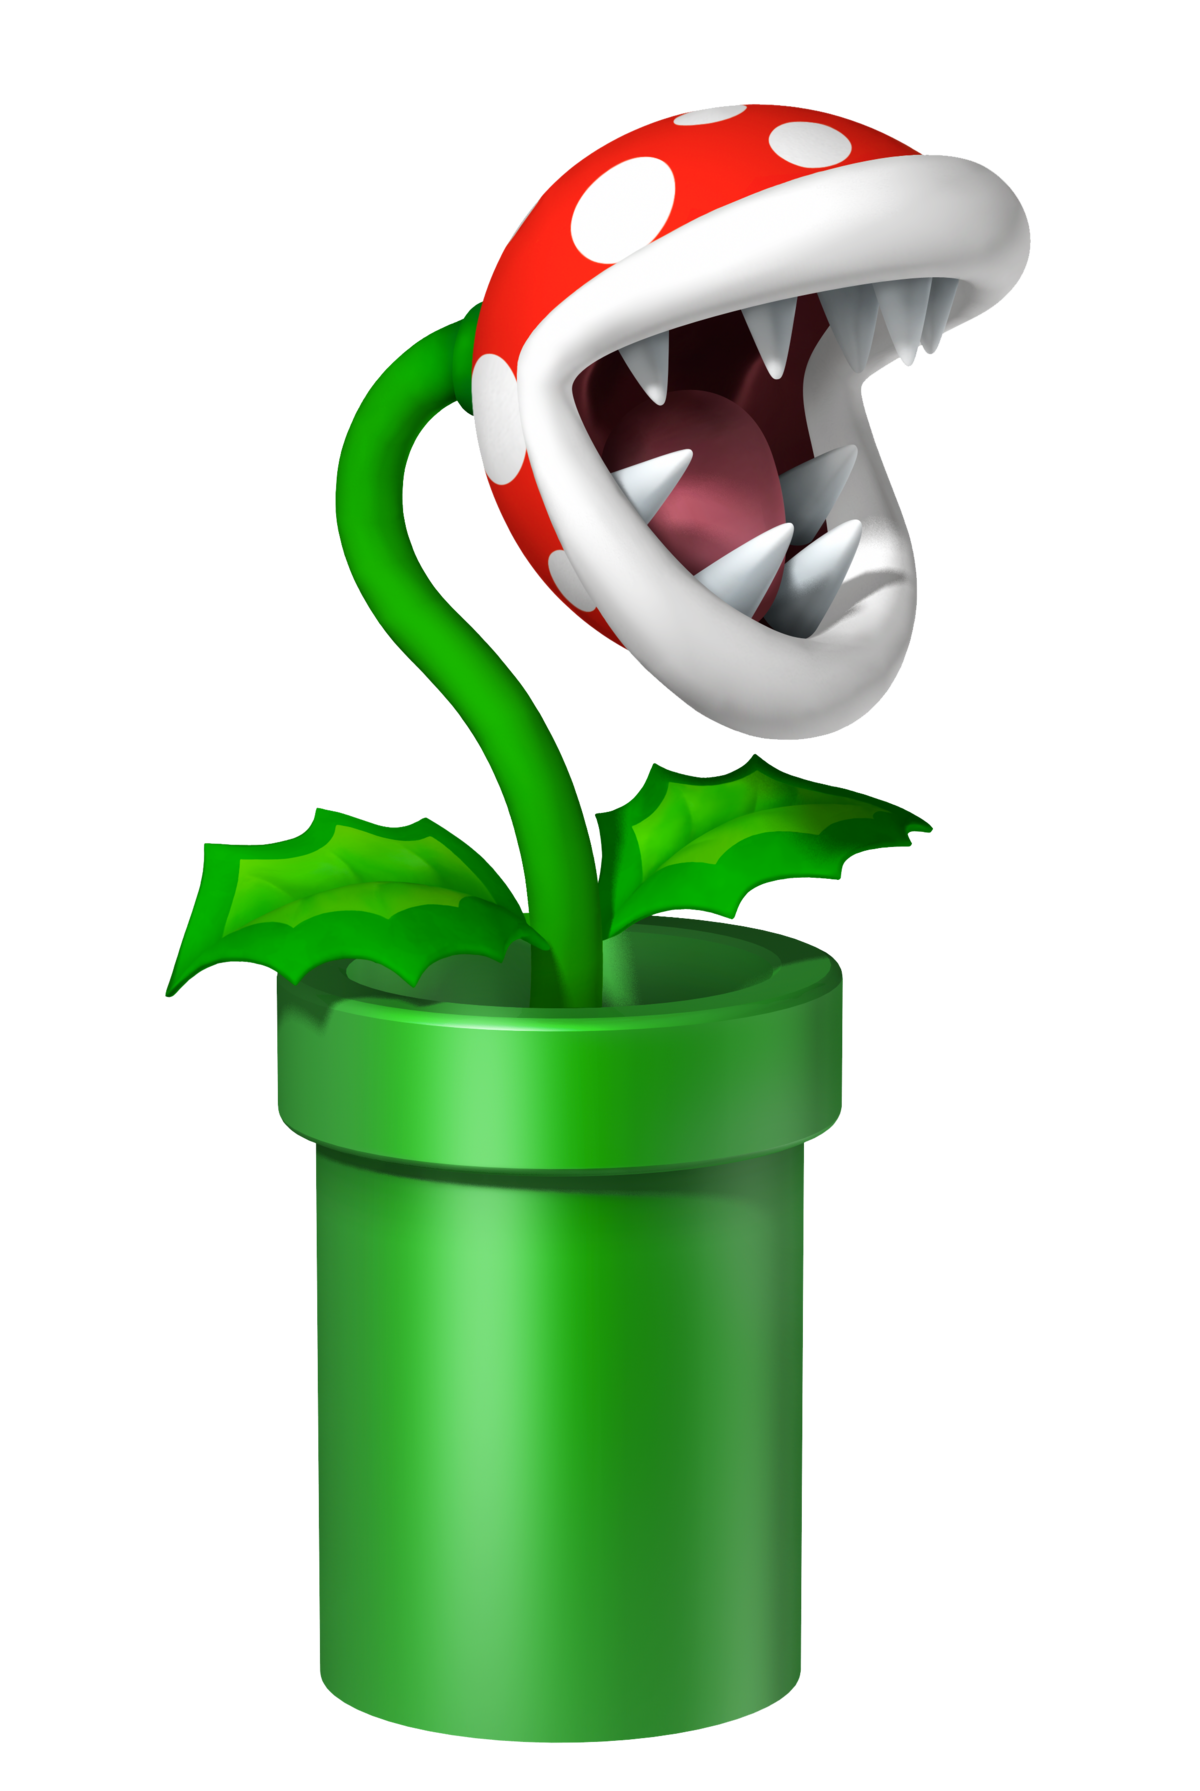 Planta pira a smashpedia - Plante carnivore mario ...